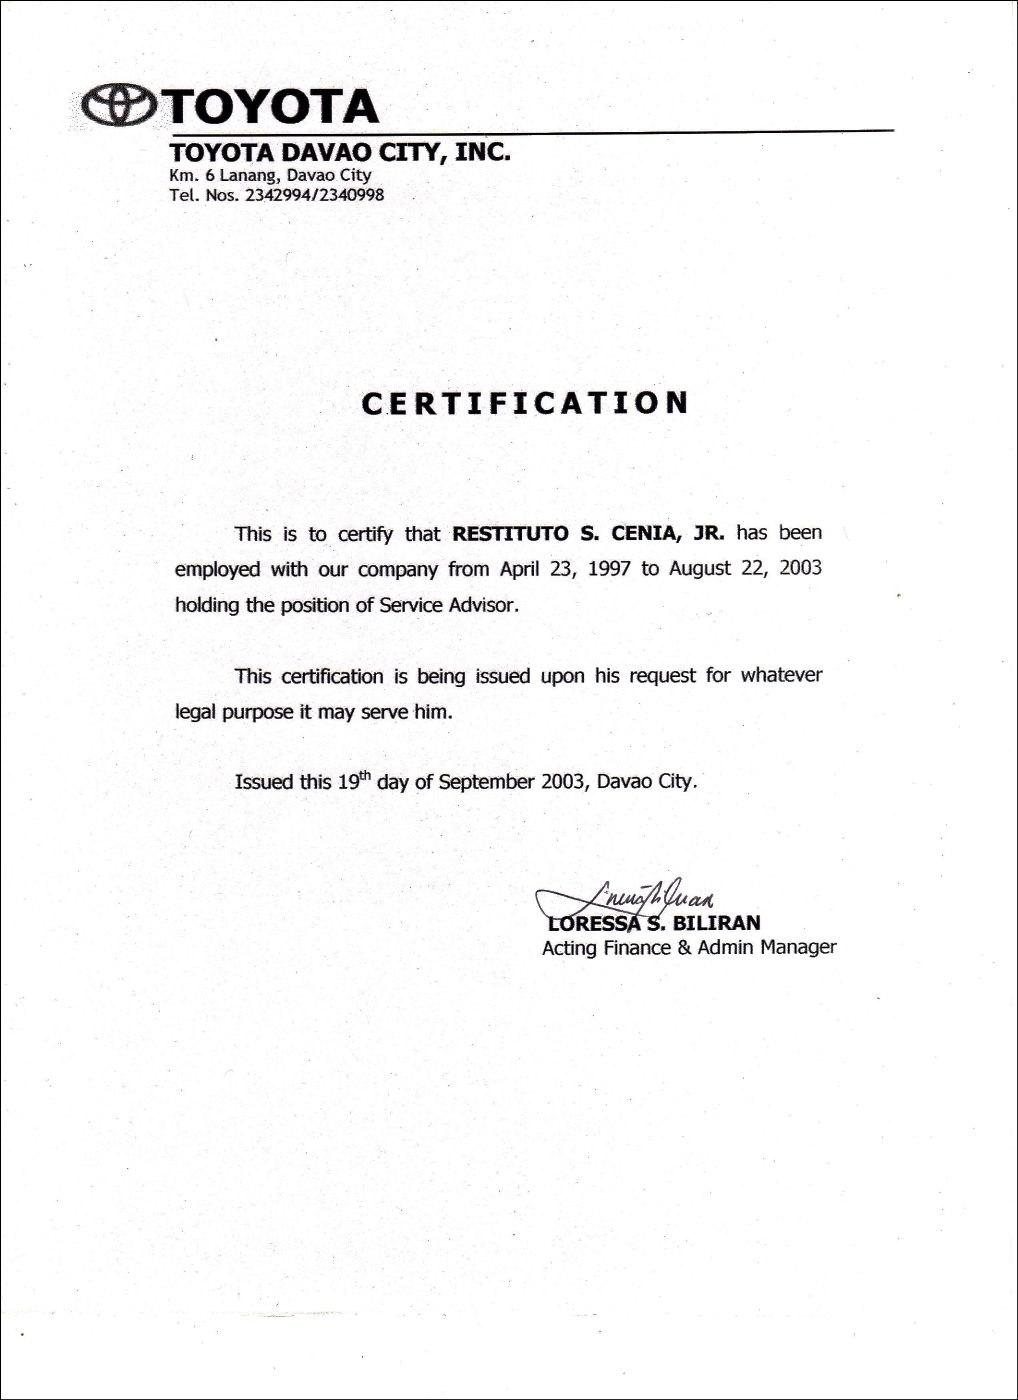 Employment Certificate Sample Best Templates Pinterest Marriage Regarding Long Service Certificate Template Sample